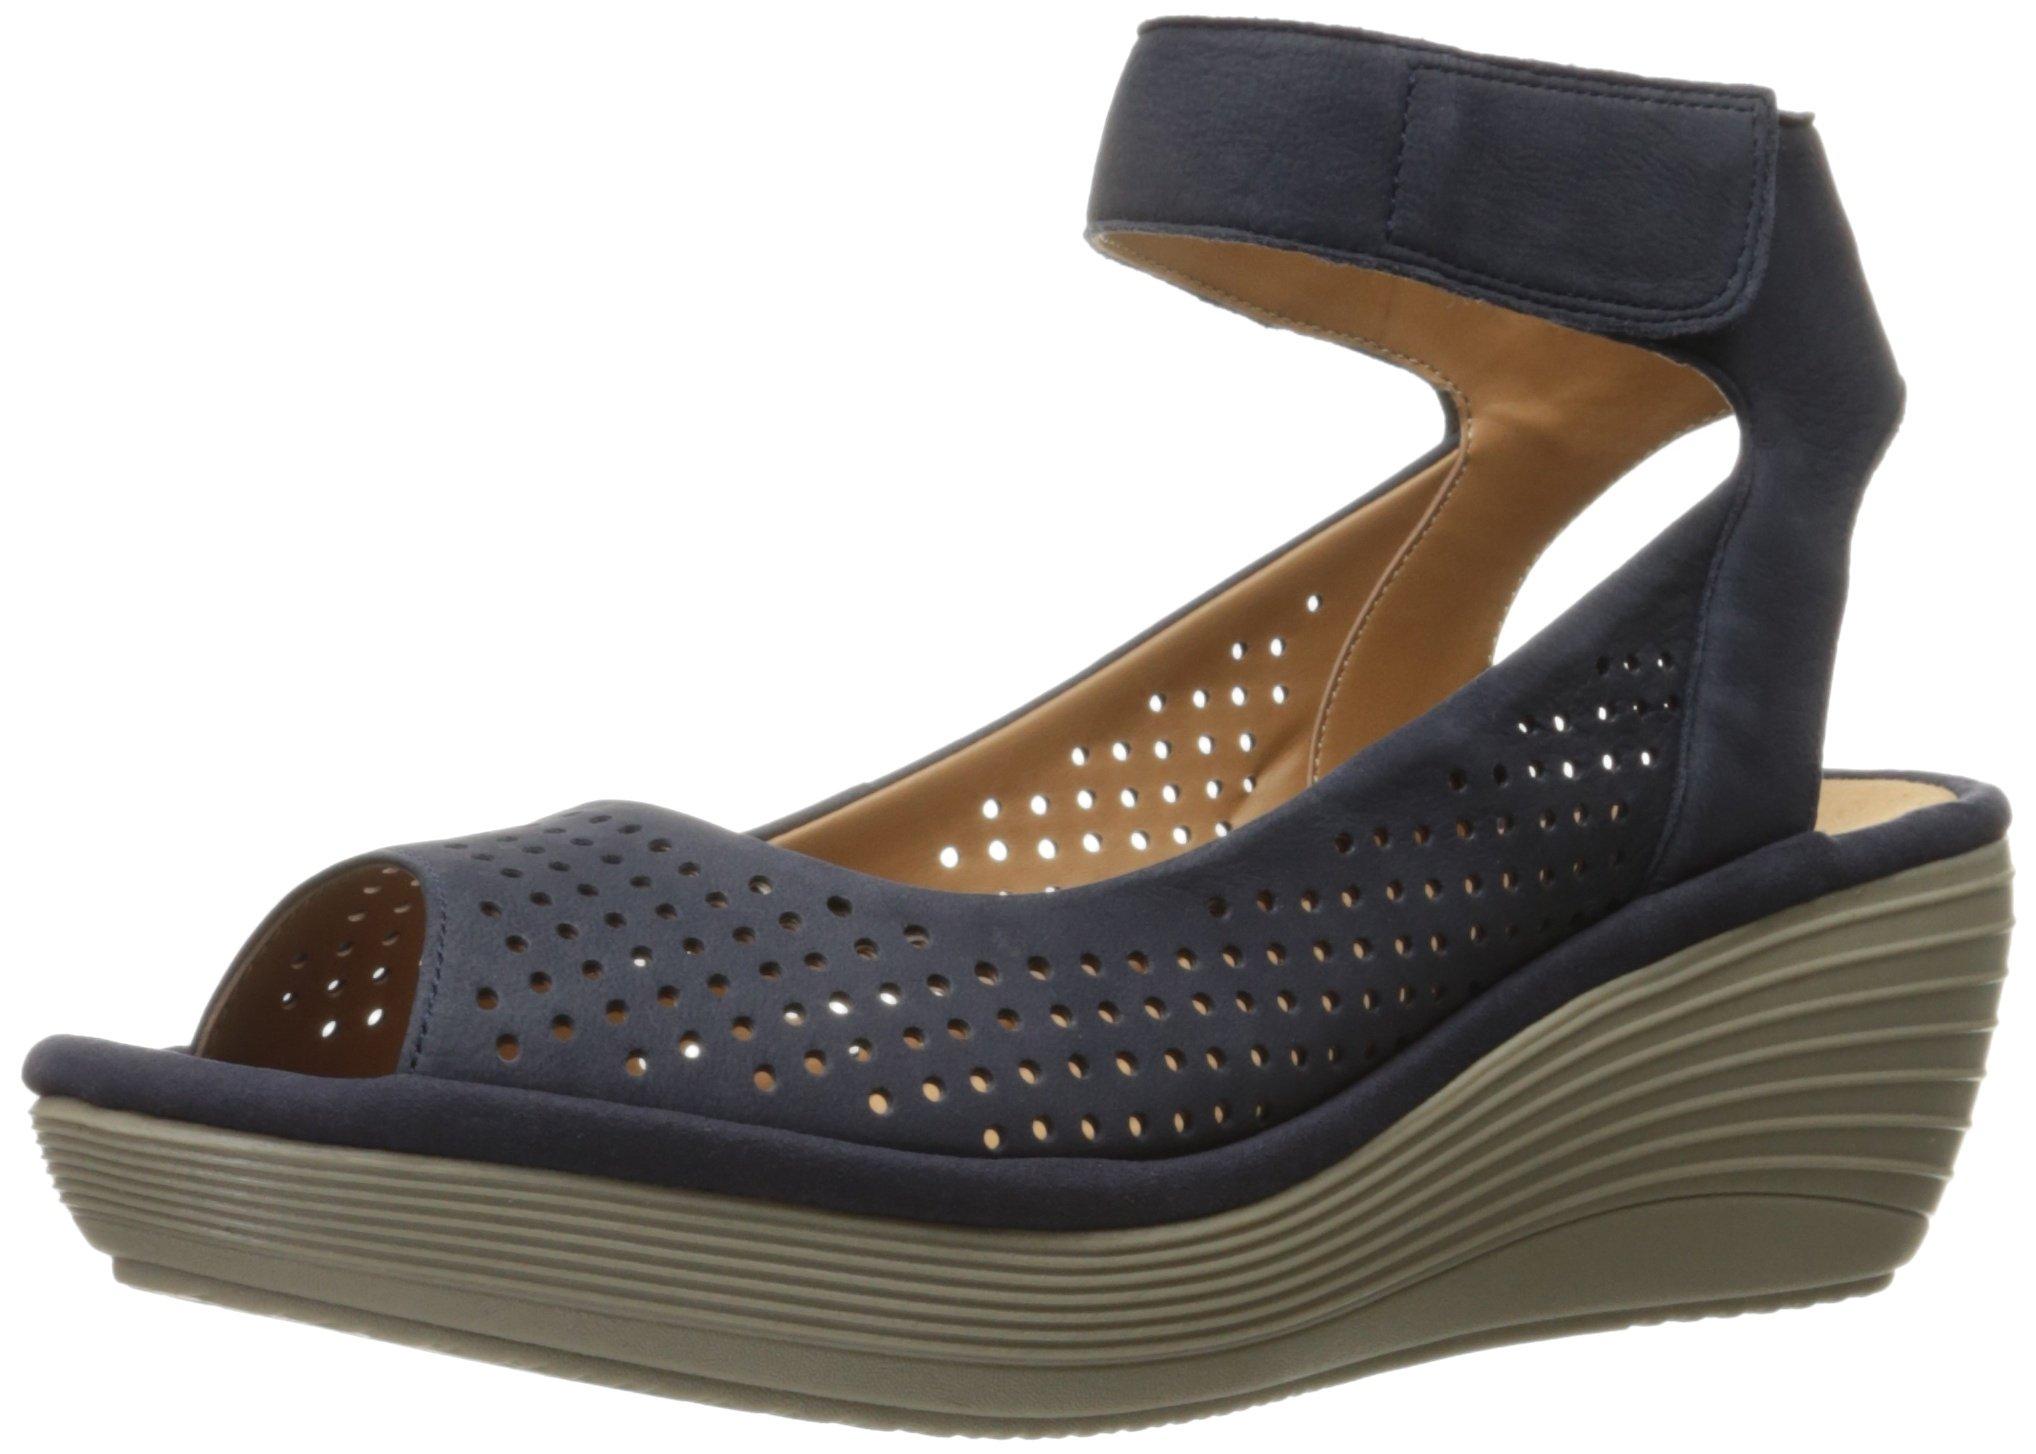 CLARKS Women's Reedly Salene Wedge Sandal, Navy Nubuck, 10 M US